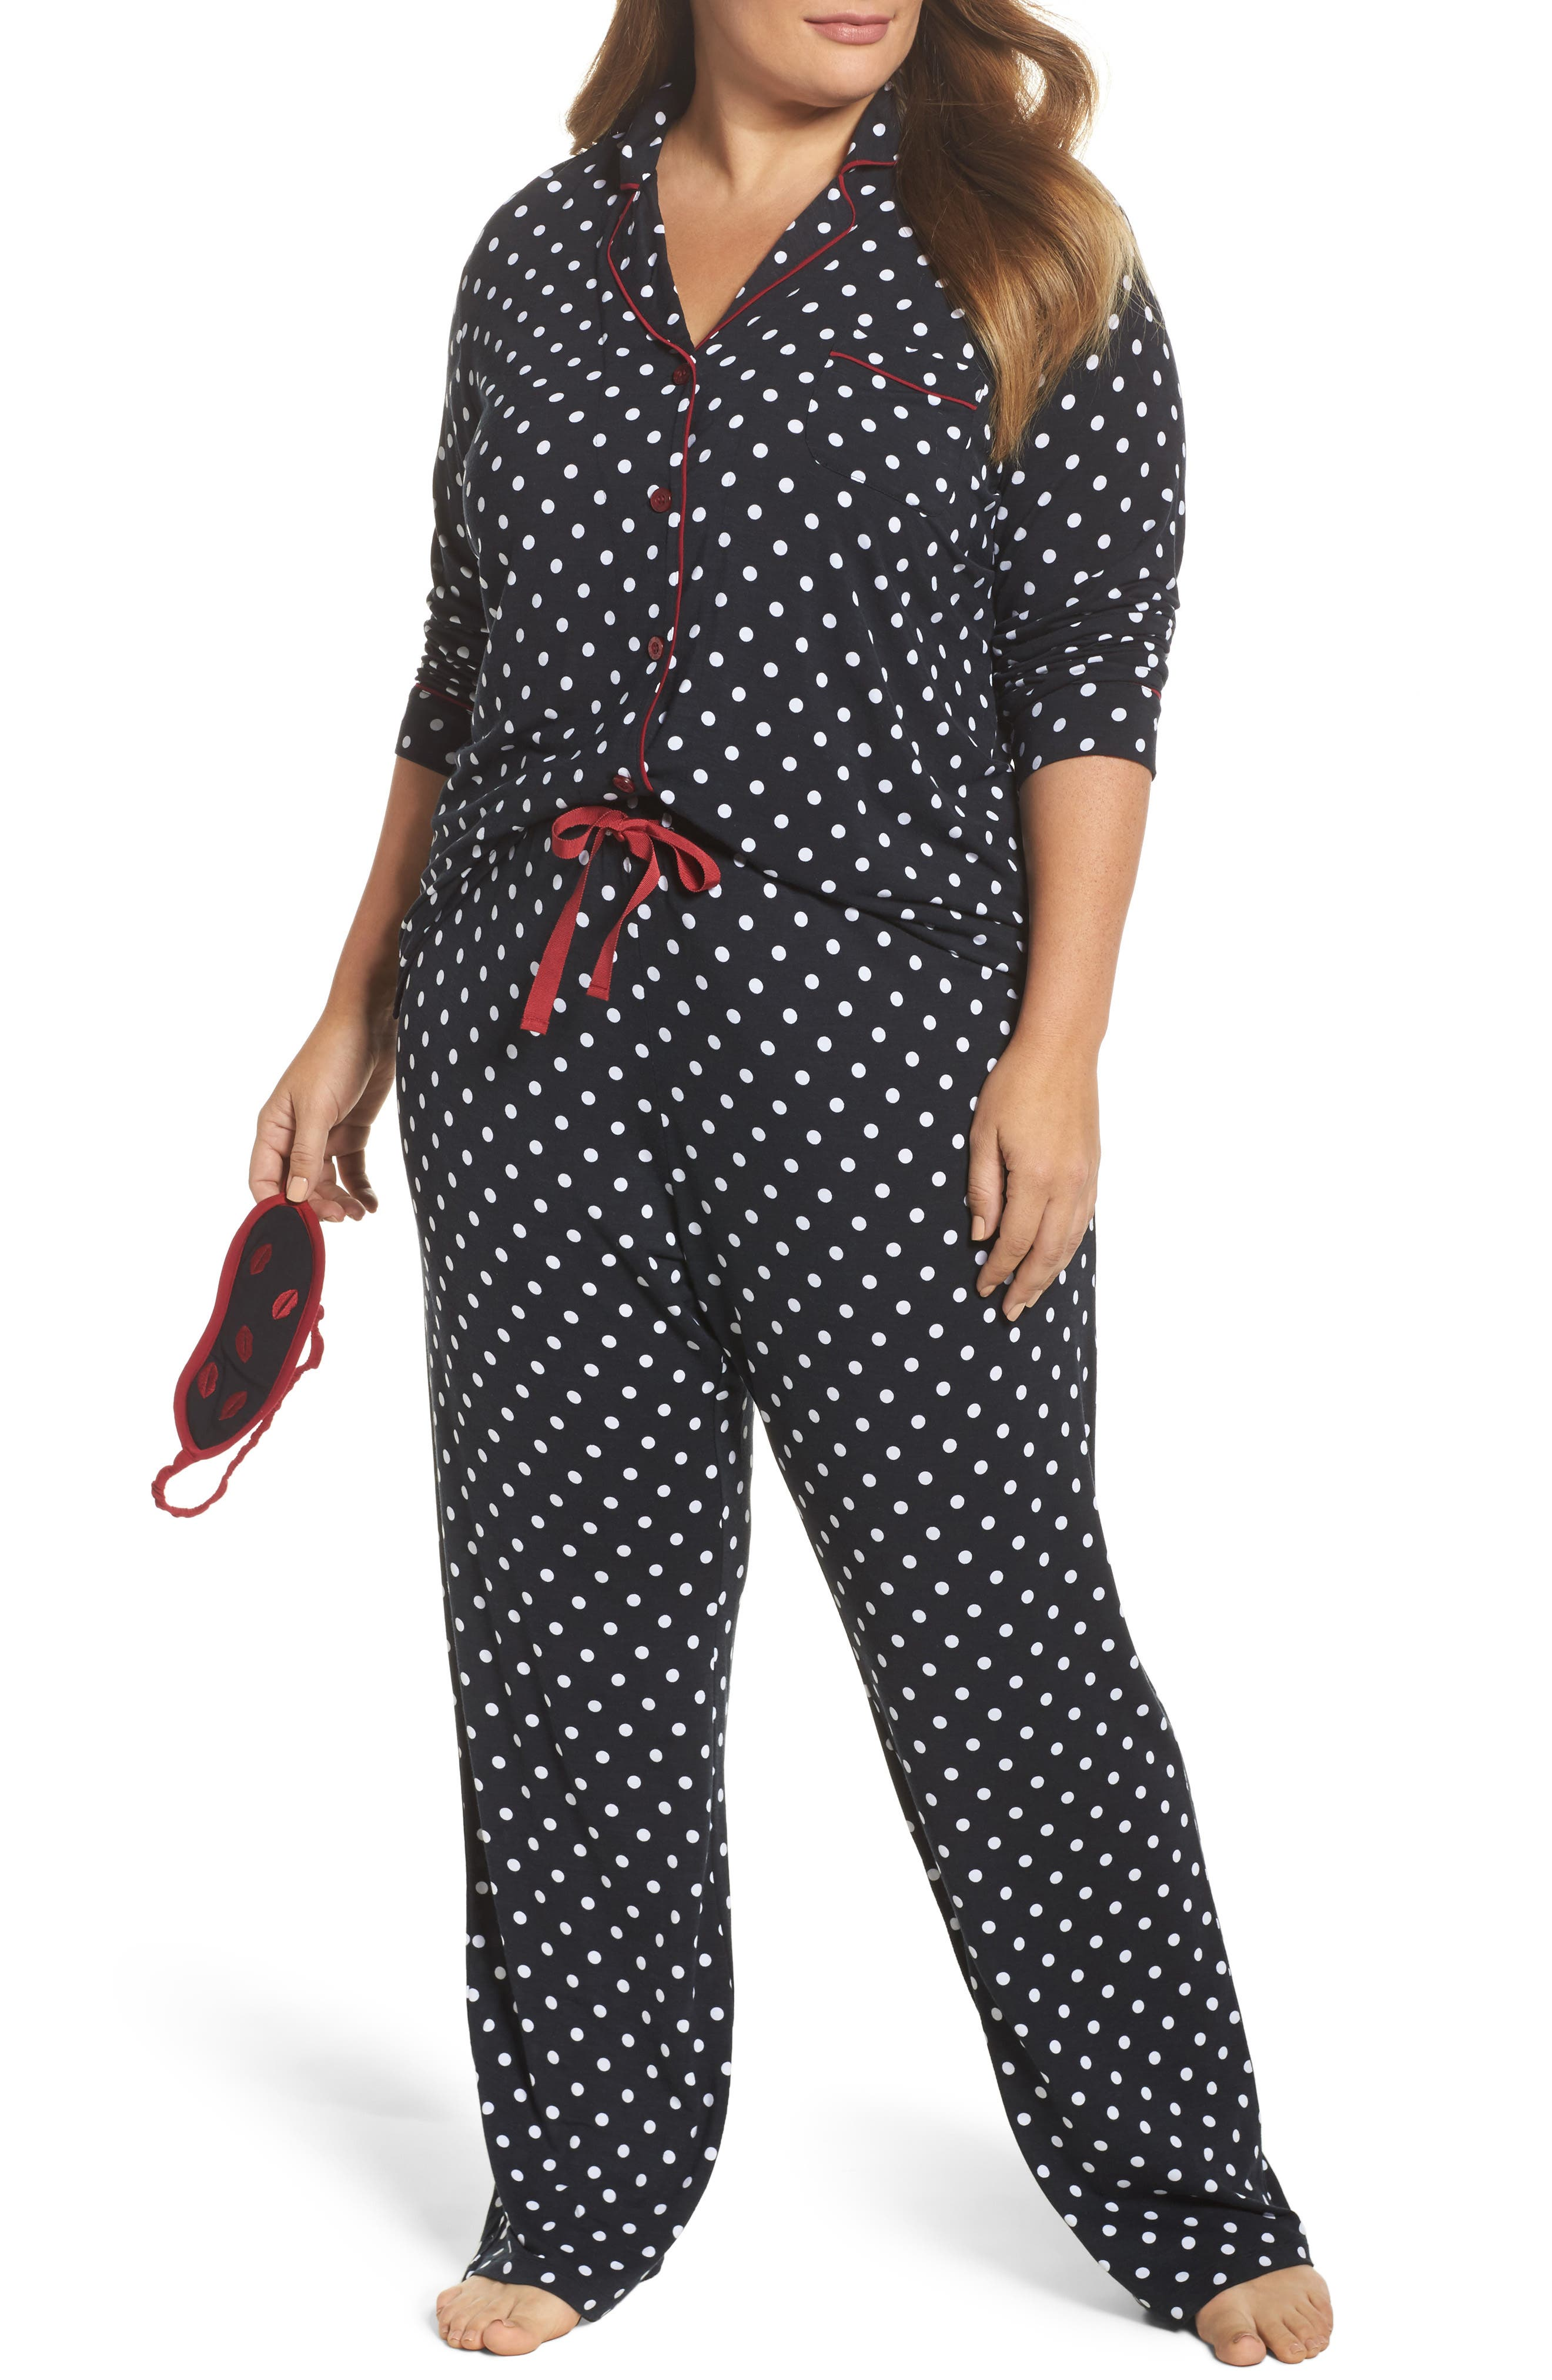 Stretch Modal Pajamas & Eye Mask,                             Main thumbnail 1, color,                             001